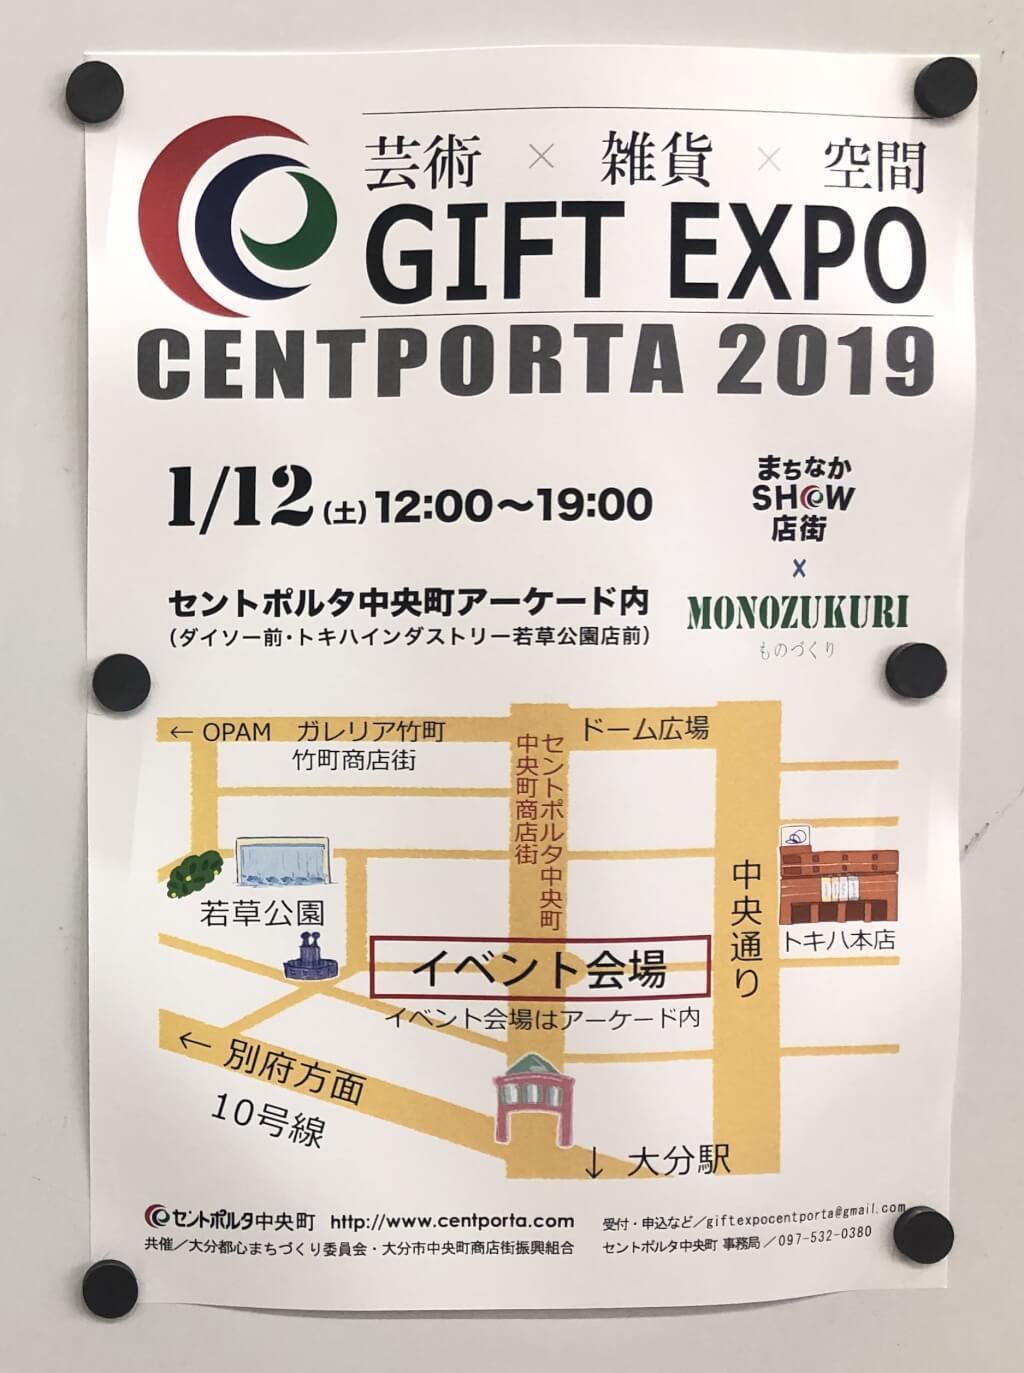 GIFT EXPO CENTPORTA